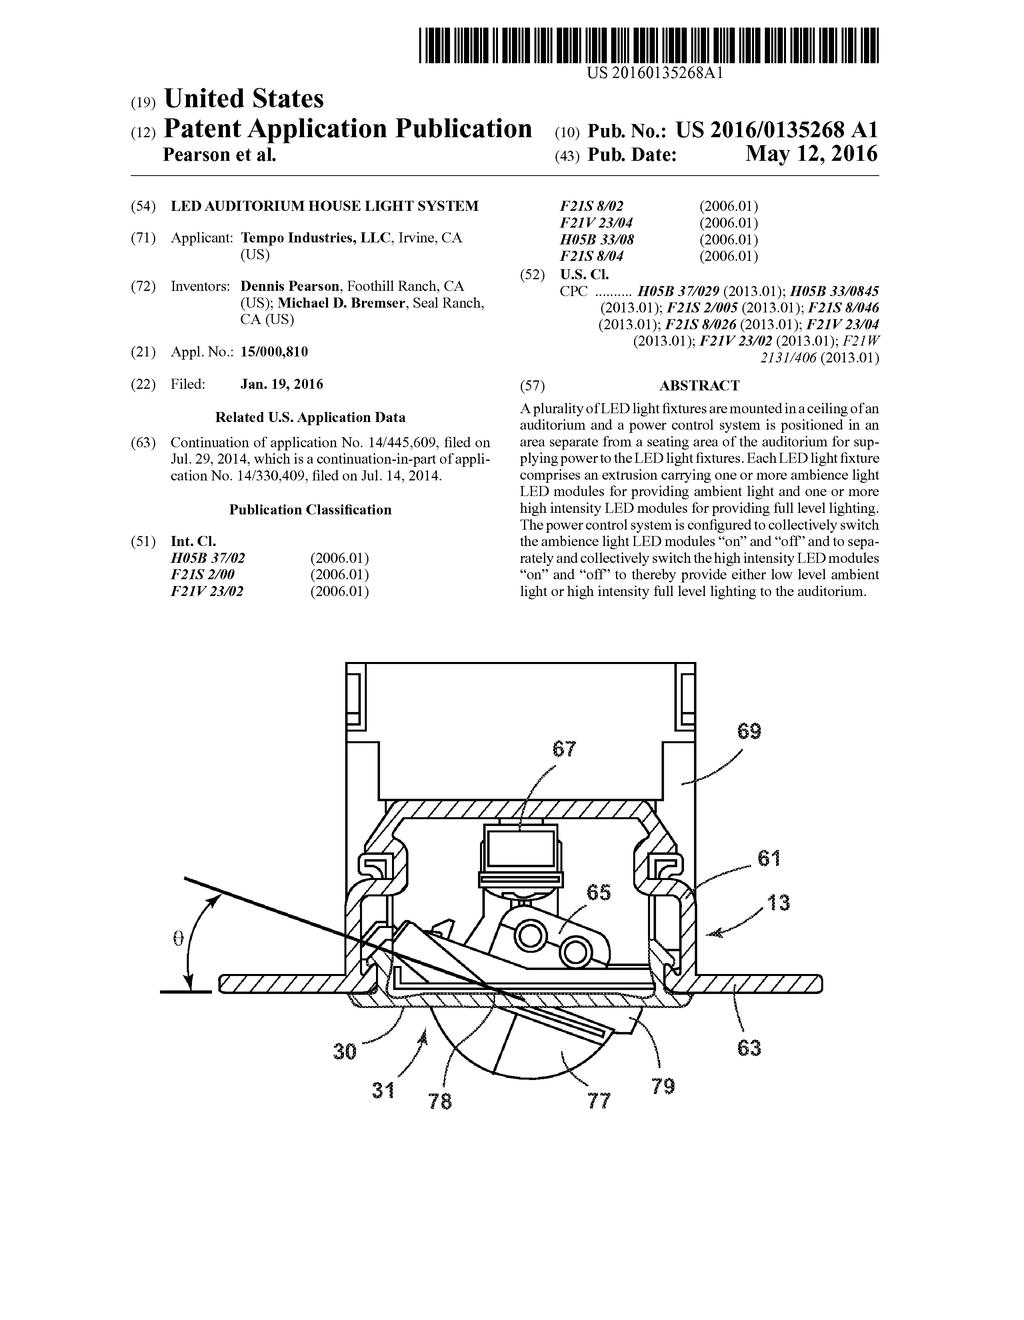 sc 1 st  Patents & LED Auditorium House Light System - diagram schematic and image 01 azcodes.com